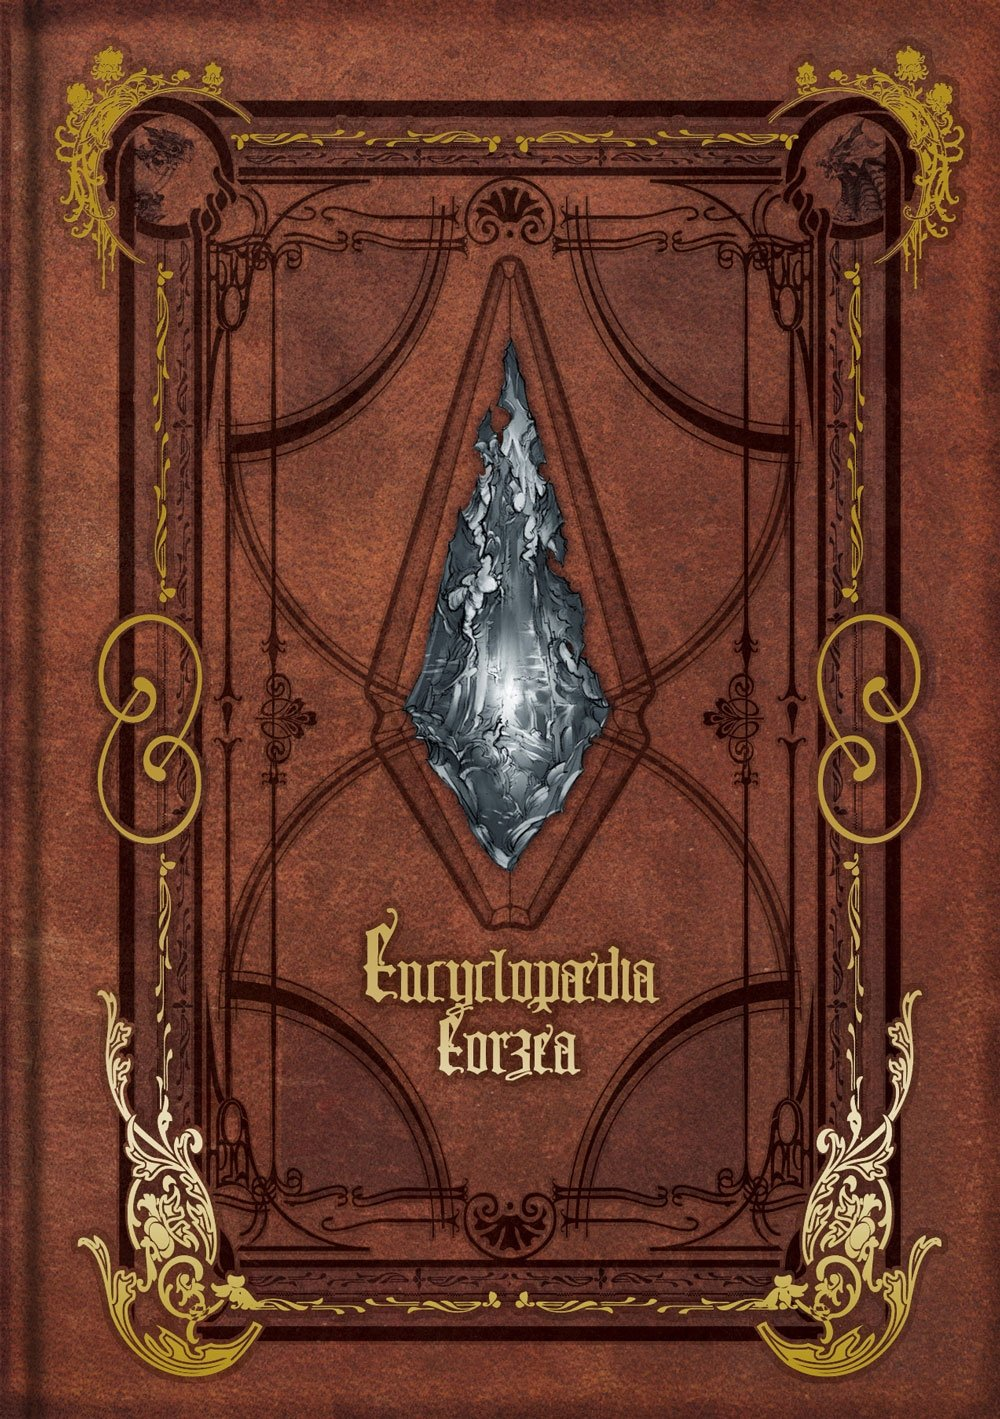 Encyclopaedia Eorzea The World Of Final Fantasy Xiv Book